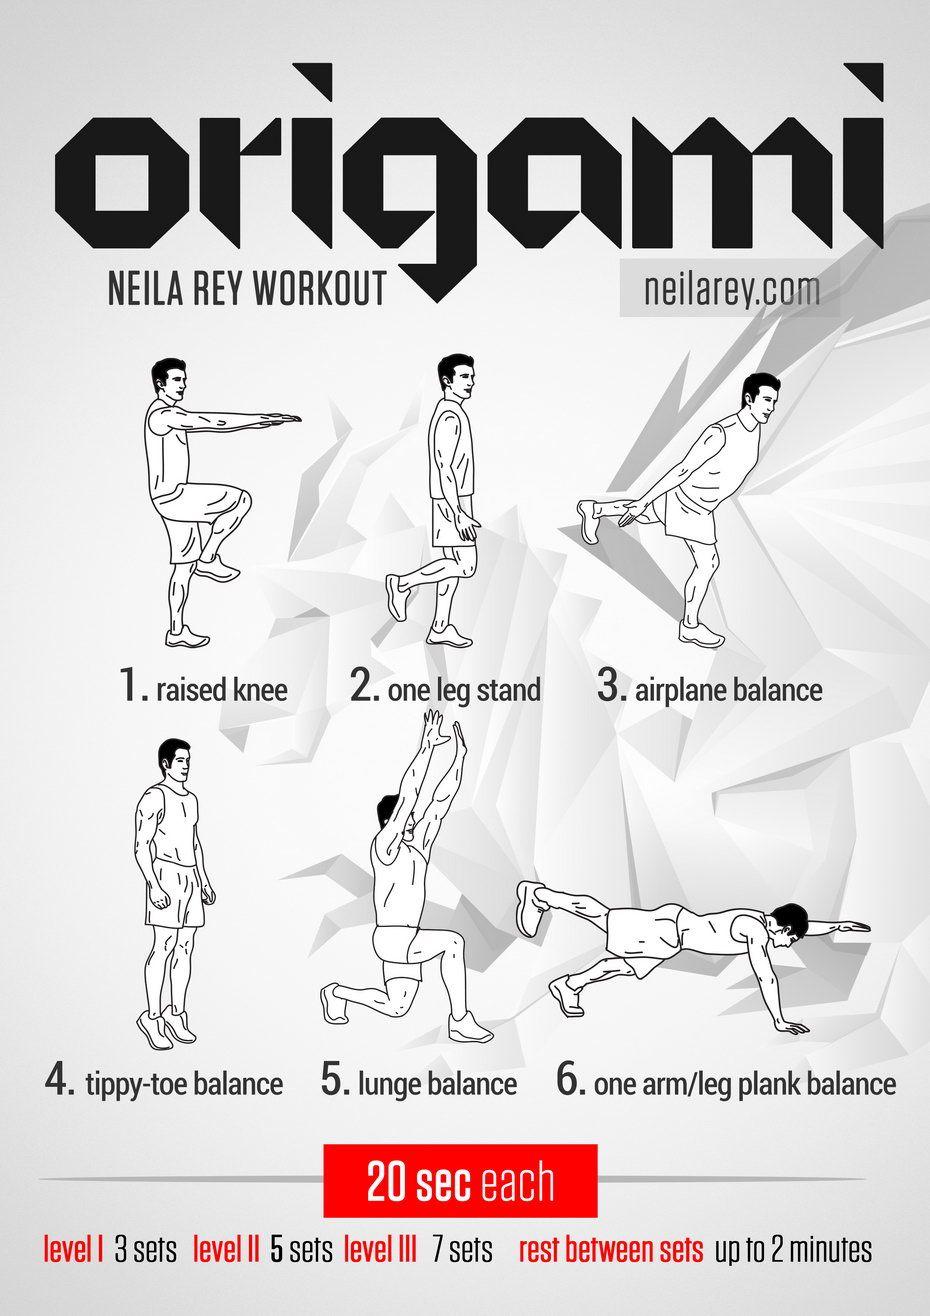 Origami Workout #fitness #balance #workout #workoutroutine